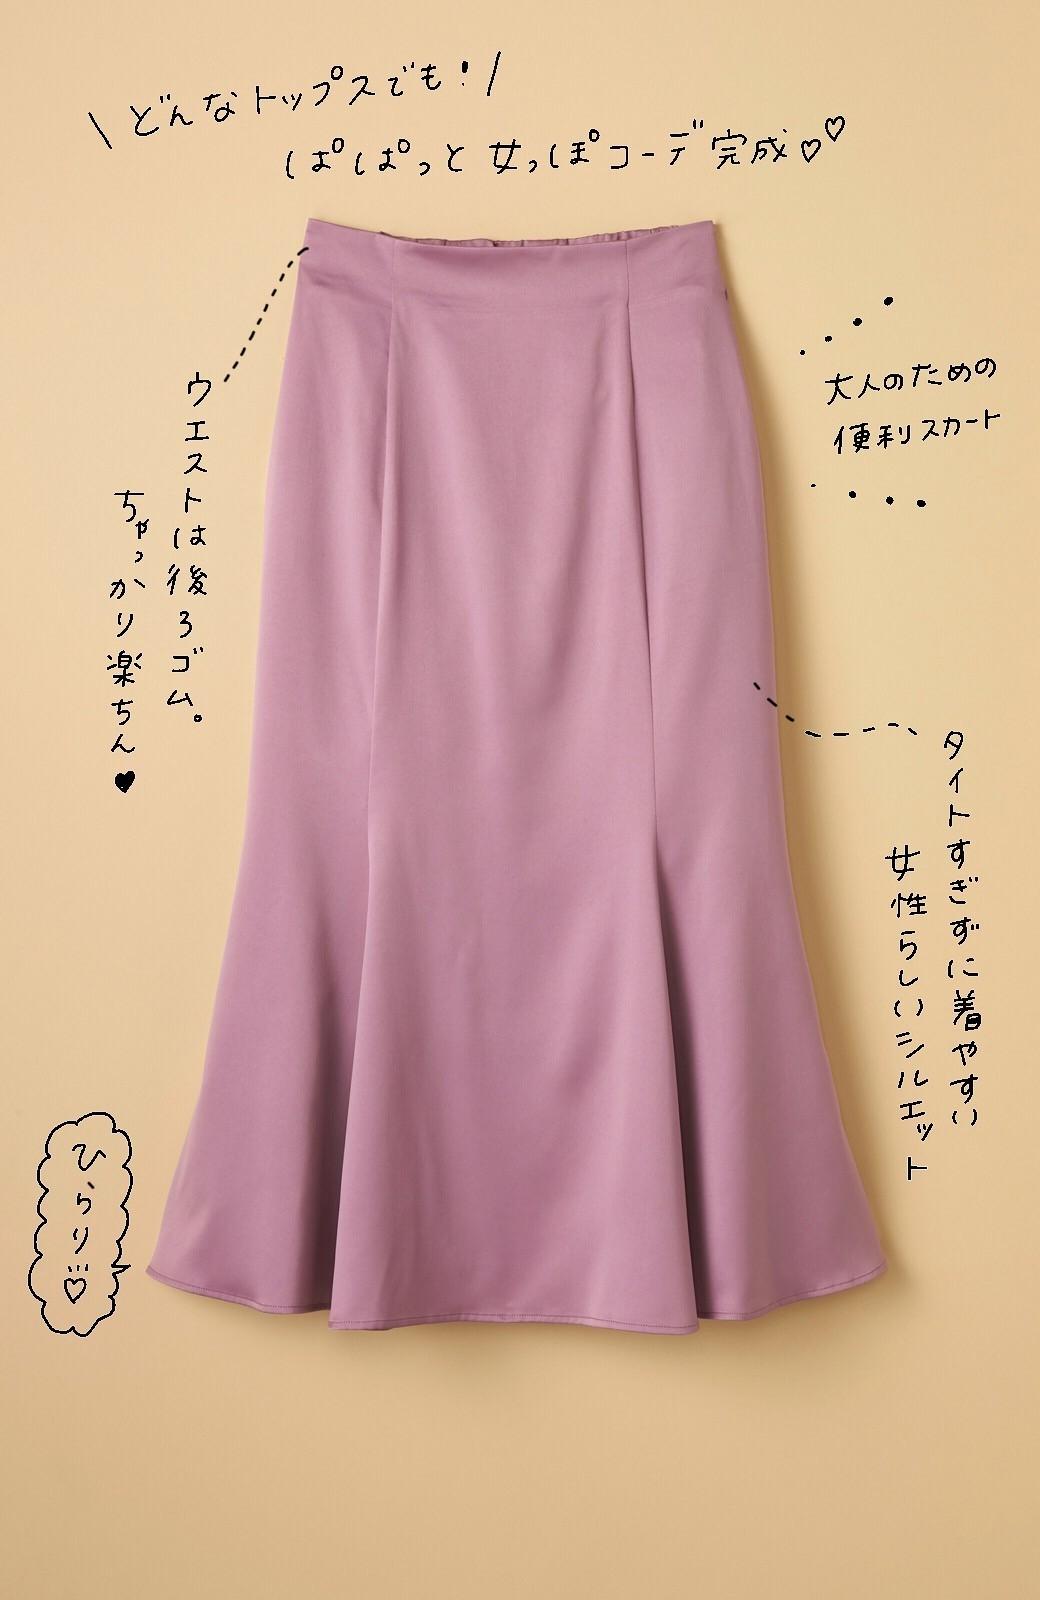 haco! スウェットやスニーカーを合わせても女っぽくいられるサテンマーメイドスカート by que made me <ピンク>の商品写真2